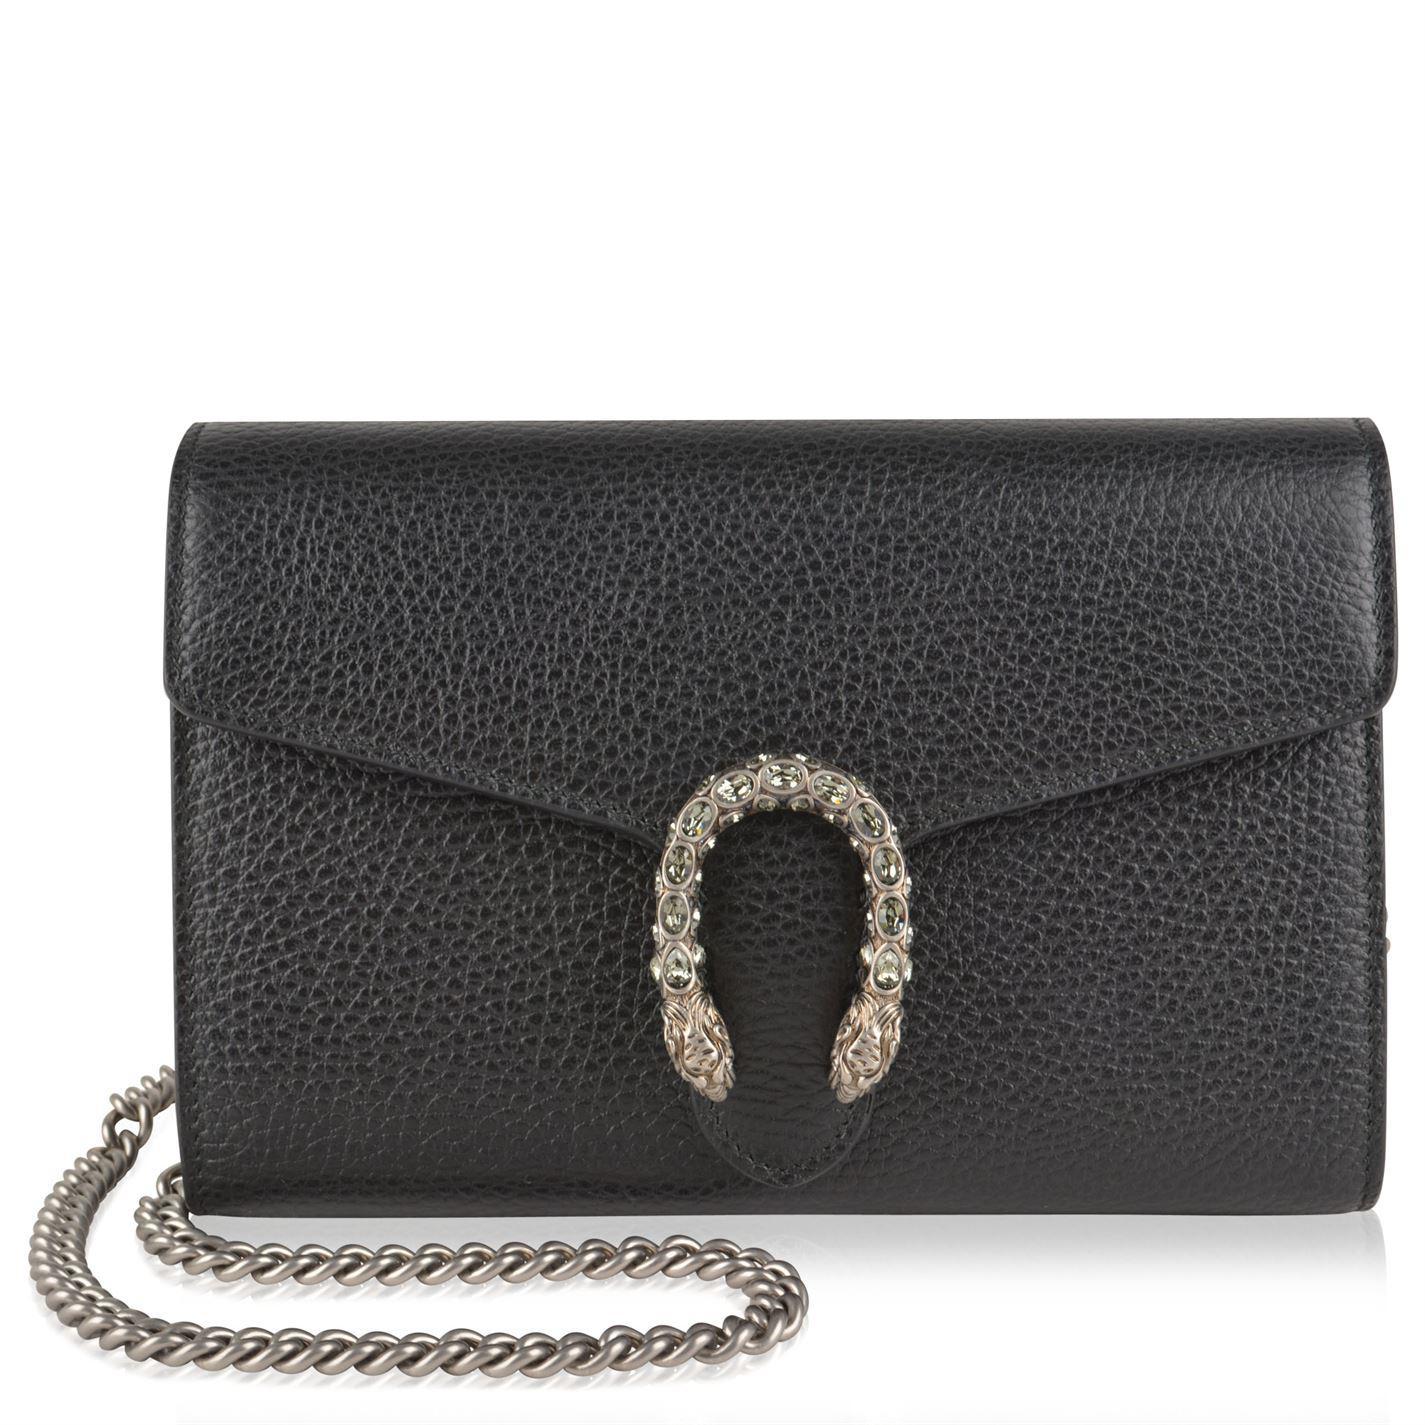 009e0f4d696dec Gucci Dionysus Mini Chain Shoulder Bag in Black - Lyst